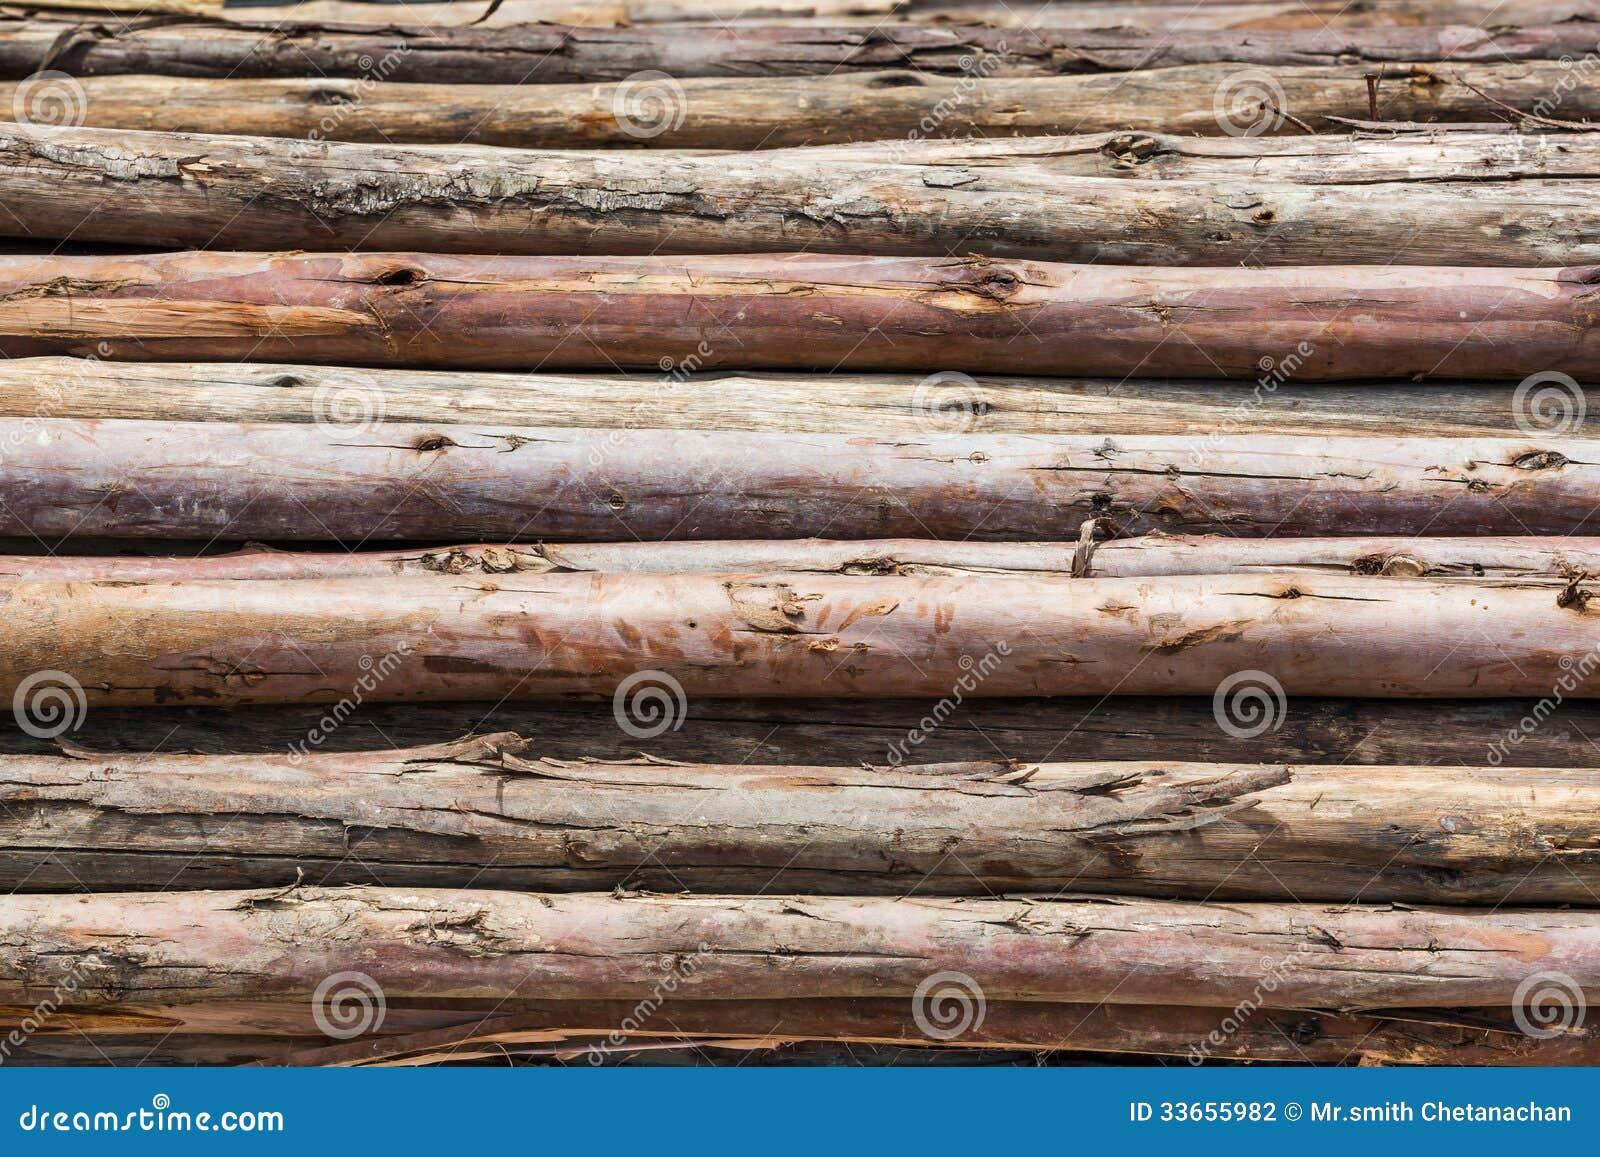 Wood Piling Construction : Wood pile stock photography image